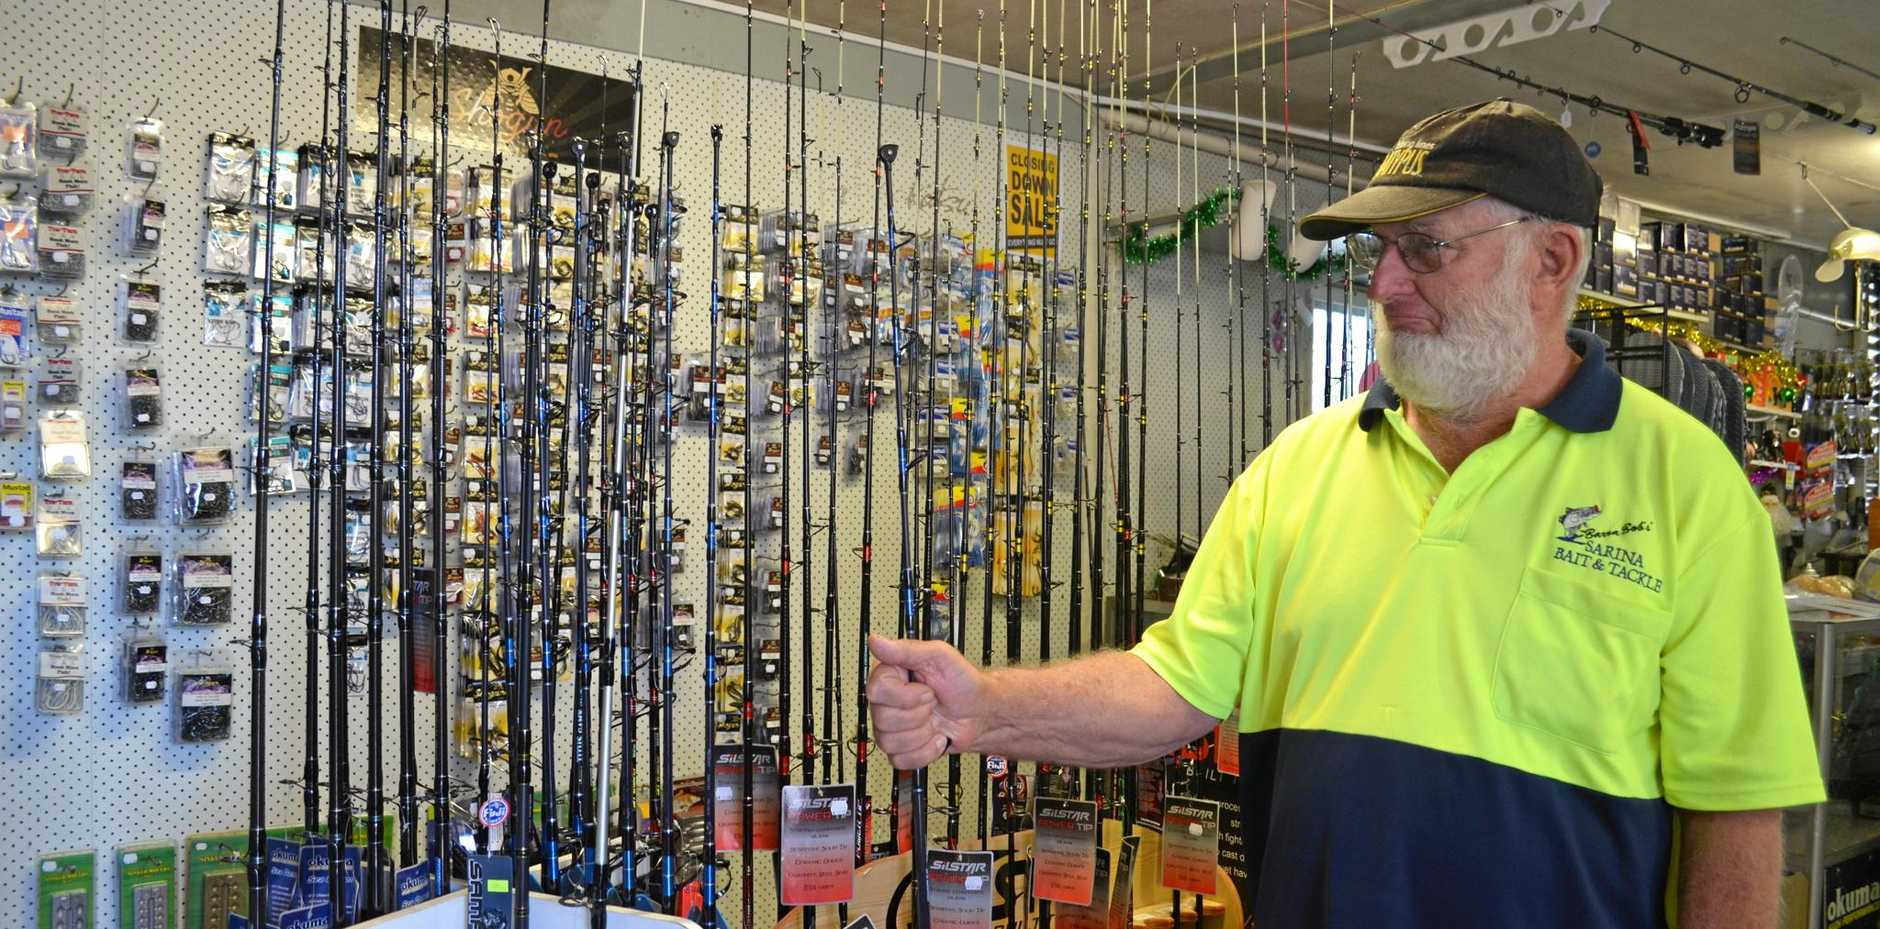 Bob Neilsen, of Barra Bob's Sarina Bait Supplies, will retire on December 31, closing down his shop.